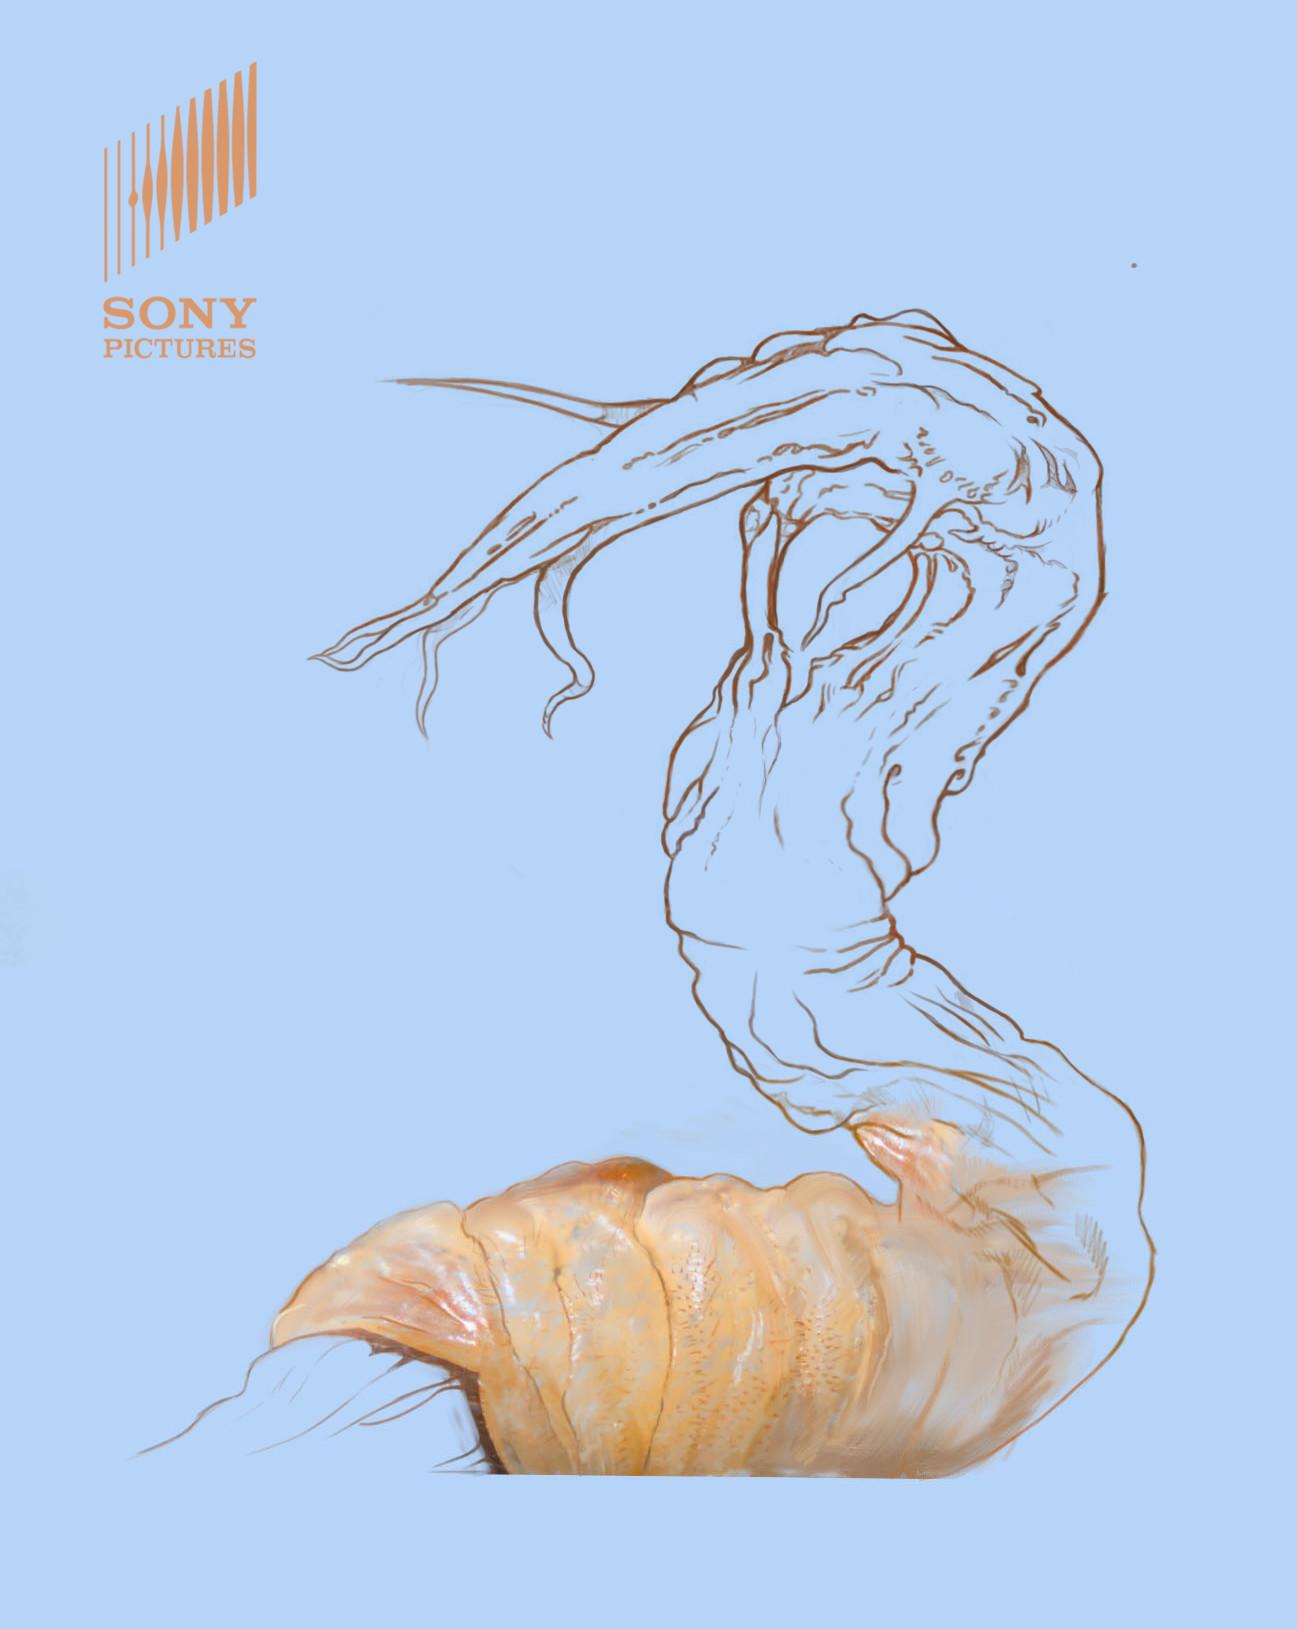 Life (2017) Creature Concept Art by Daniel Tiller